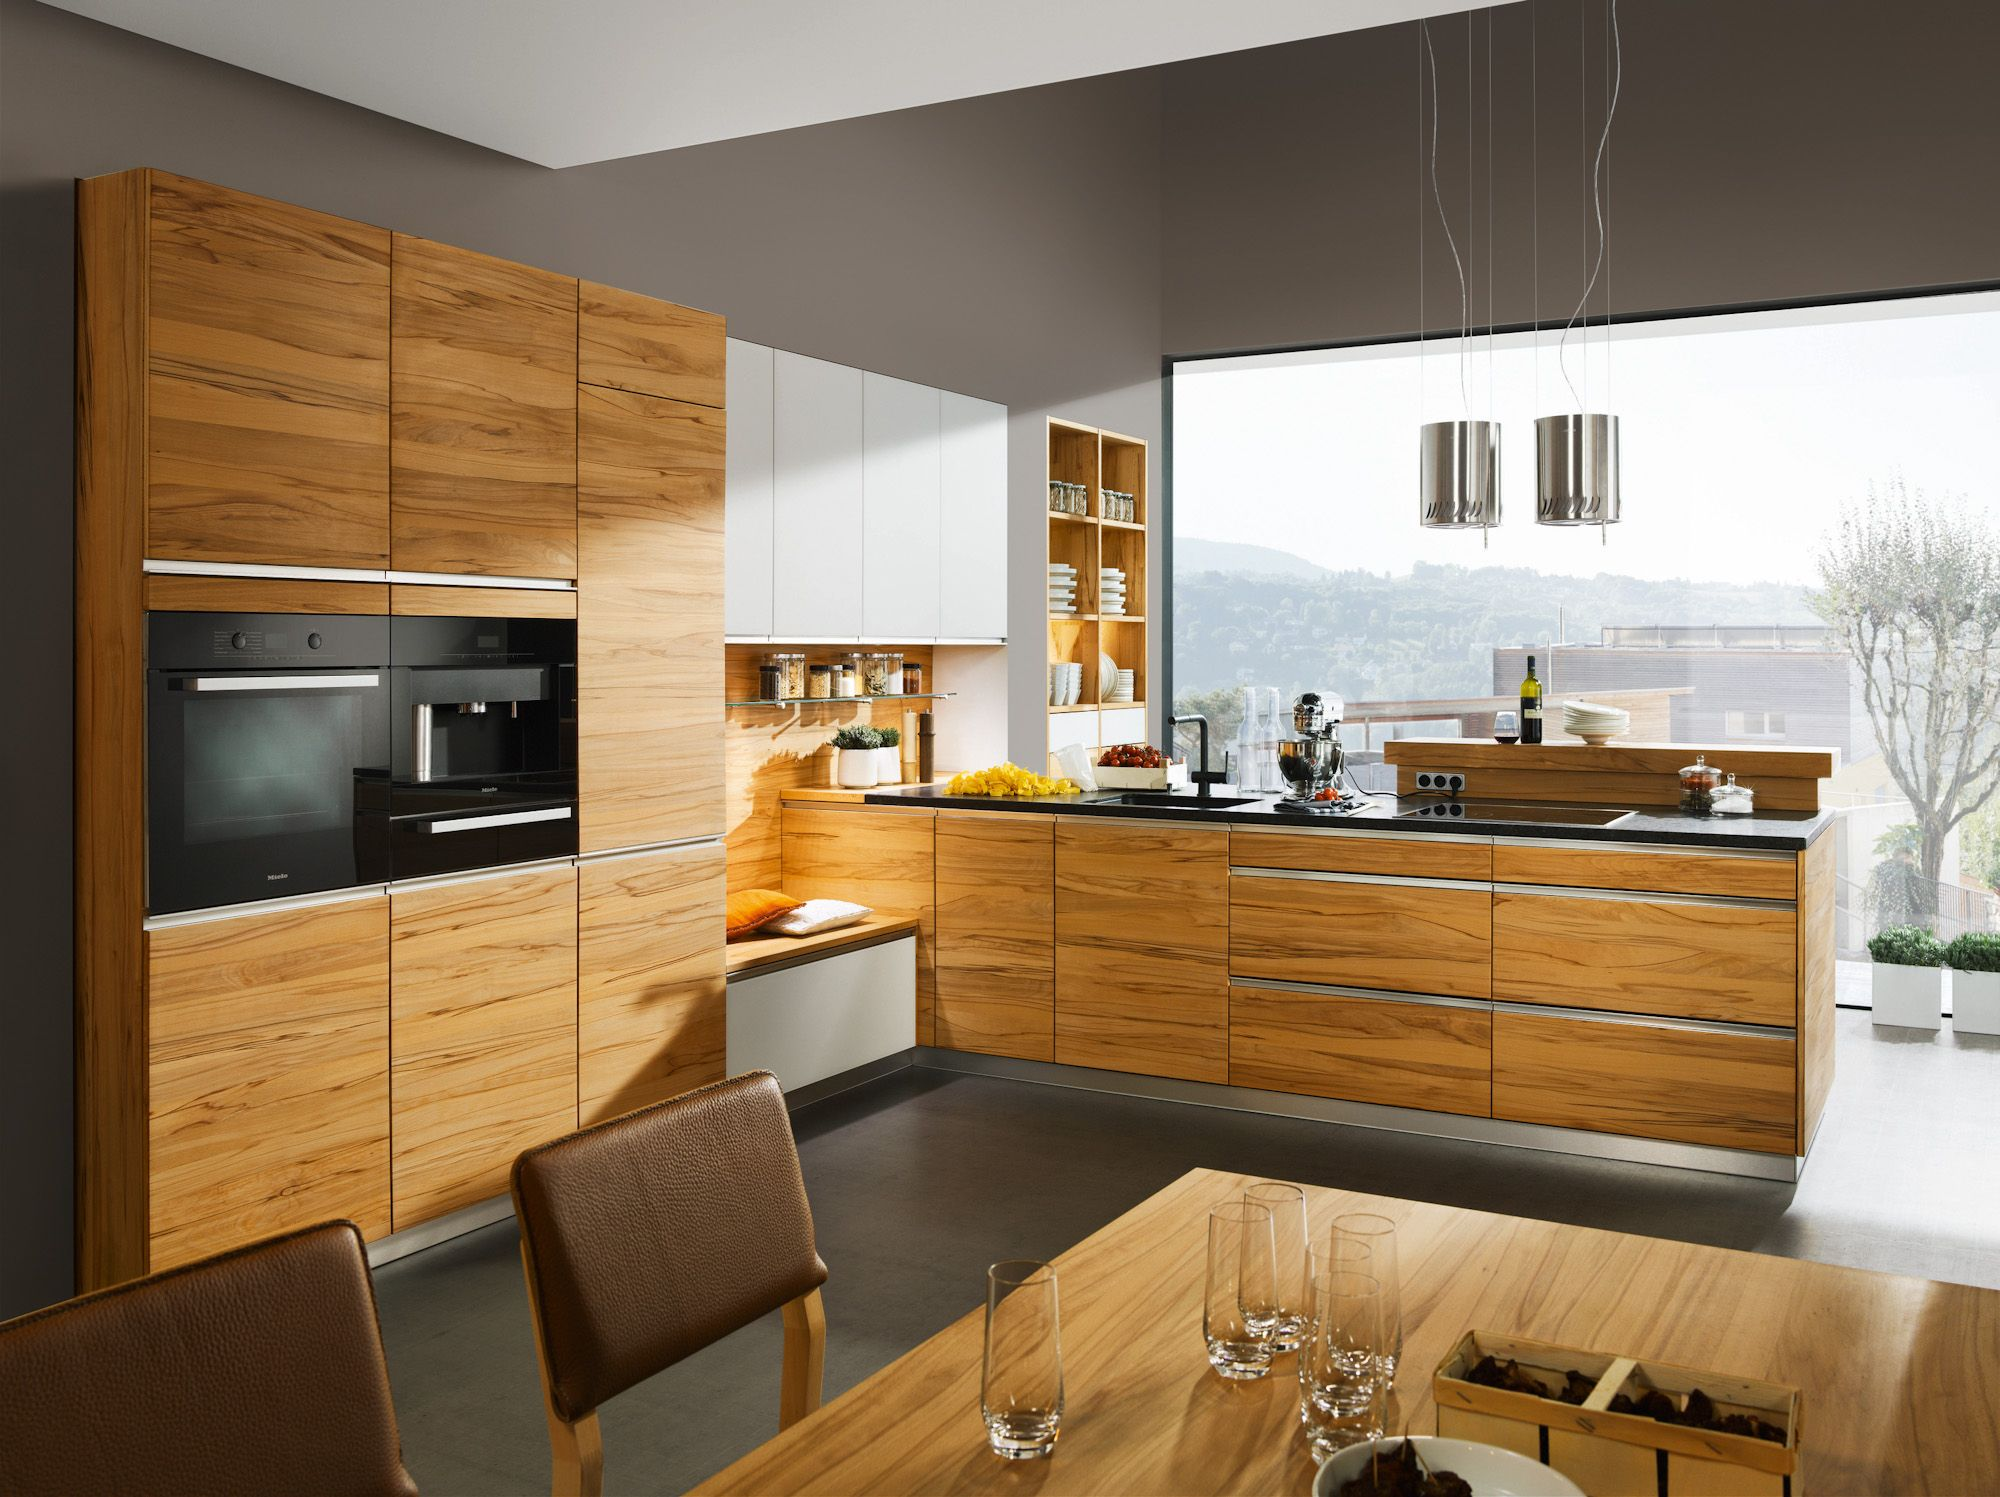 Kuche Kernbuche Massiv Geolt Modern Wohnkuche Grifflos Bei Mobel Morschett Kuchen Mobel Massivholzkuchen Haus Kuchen